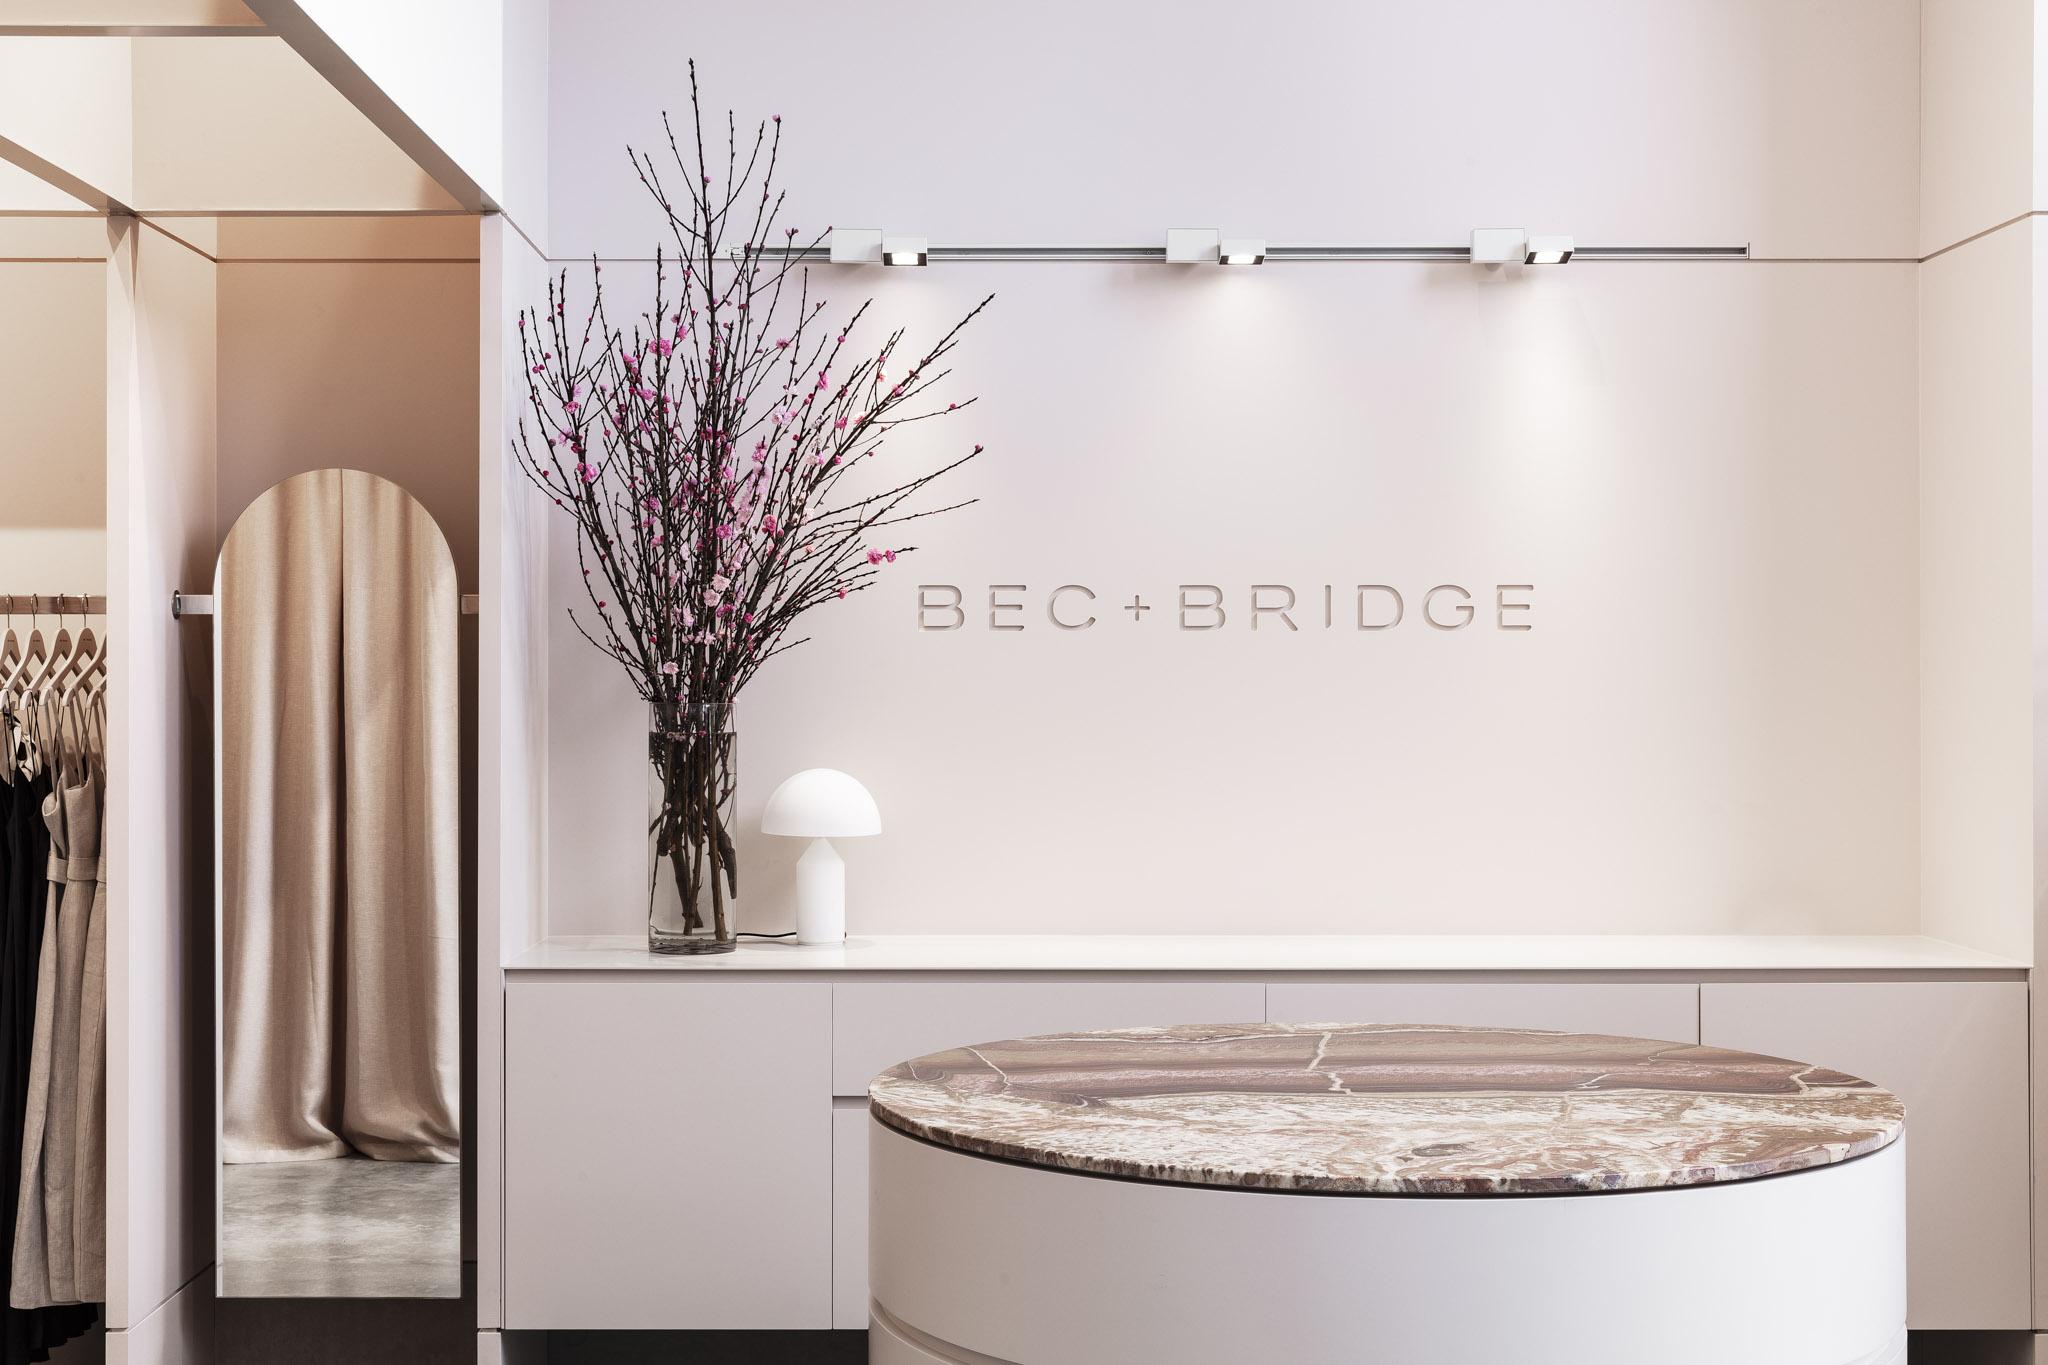 Bec + Bridge James St by George Livissianis